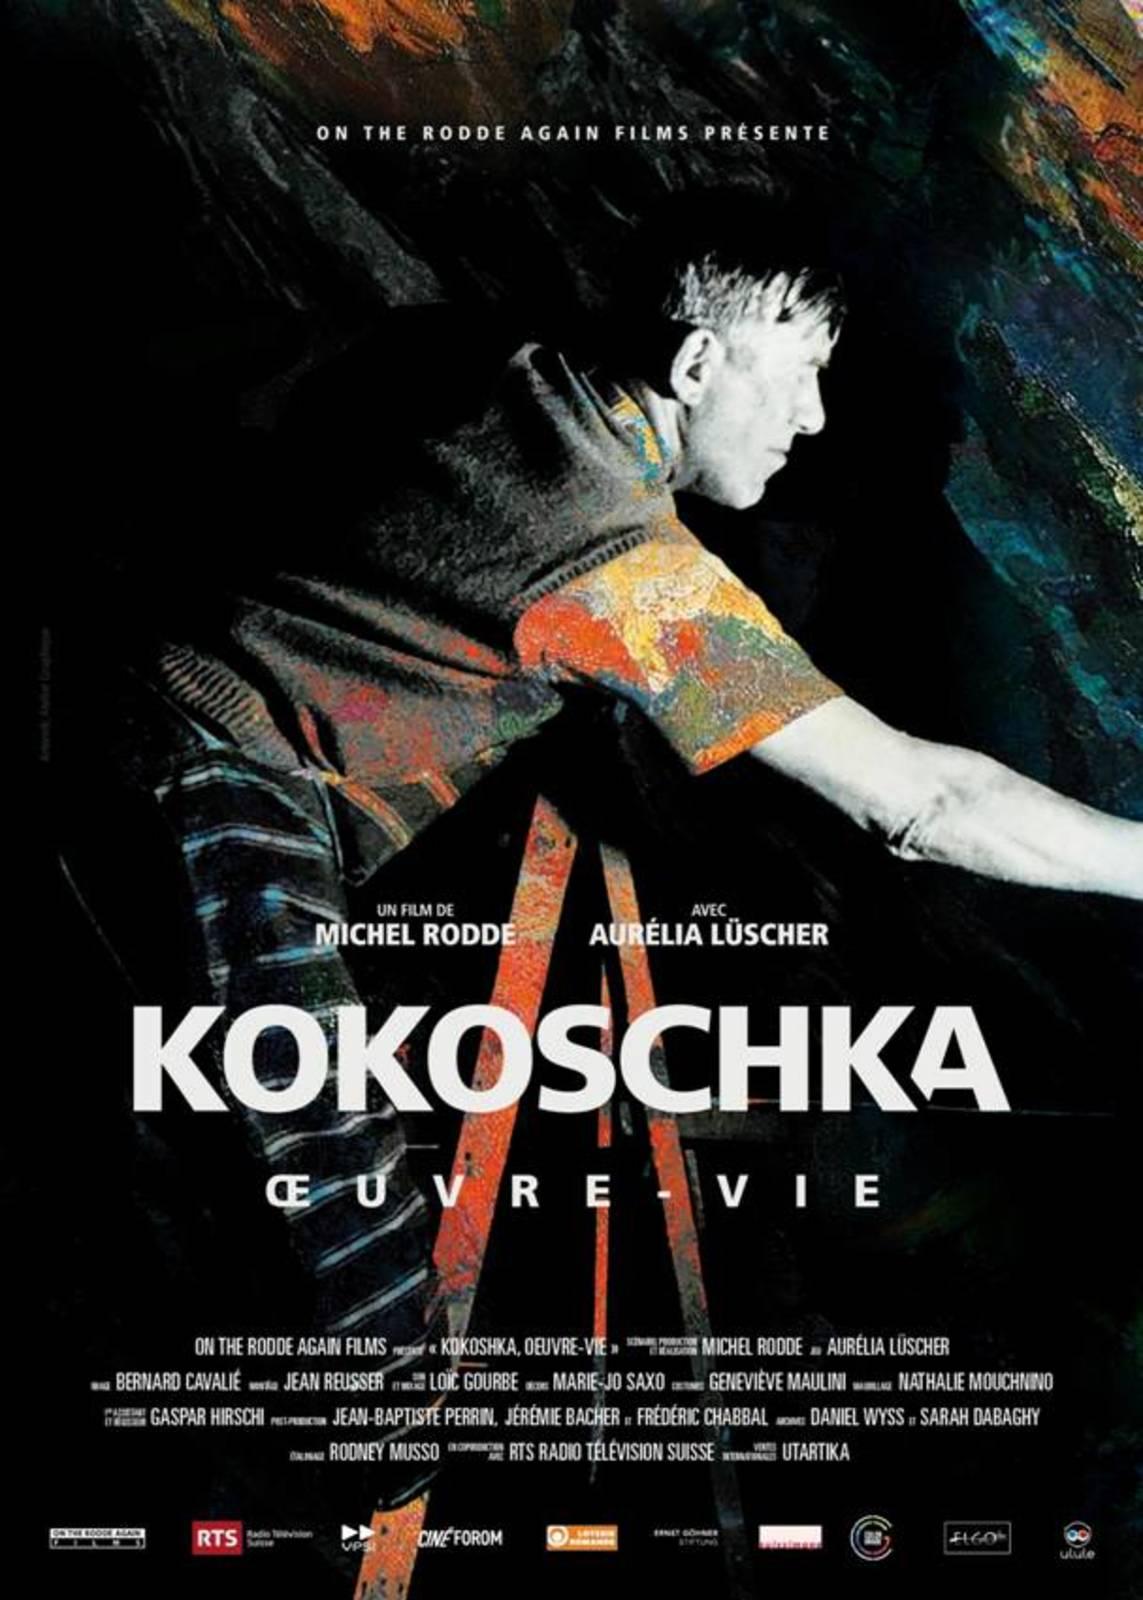 Kokoschka Oeuvre Vieun film de Michel Rodd (2017)On the Rodde Again BANDE ANNONCE